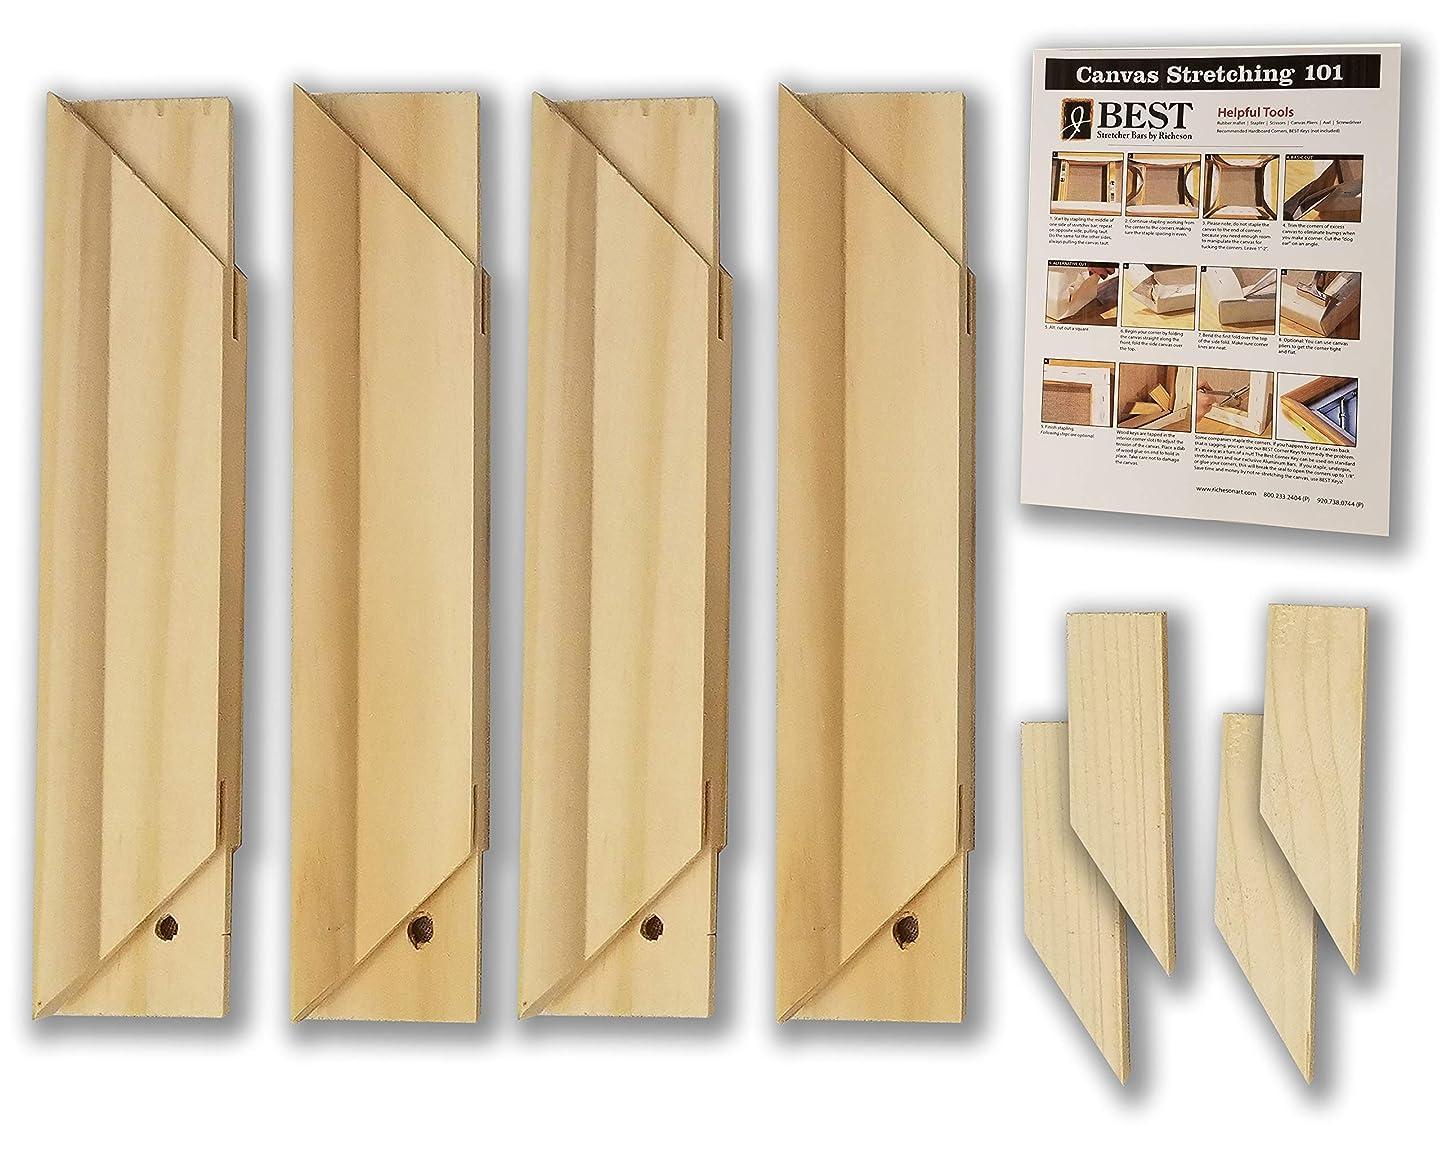 Stretcher Bar Bundle-Jack Richeson Light Duty Stretcher Bars, 12 Qty 4; Wood Keys; Canvas Stretching 101 Guide (9 Items)